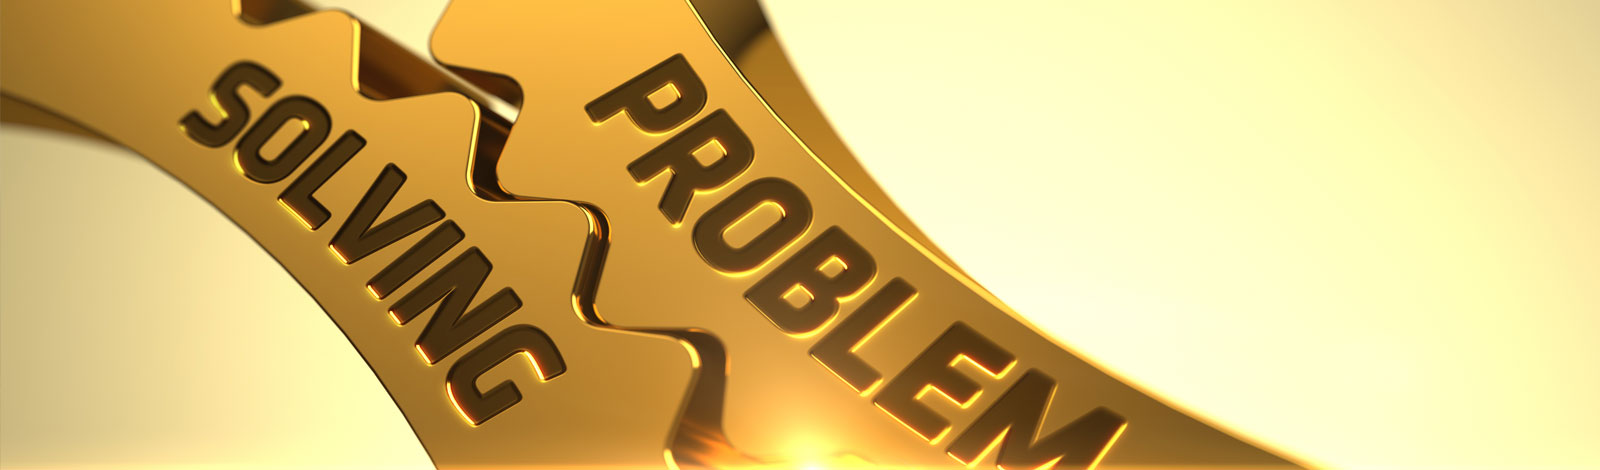 banner 99 - 99 Probleme